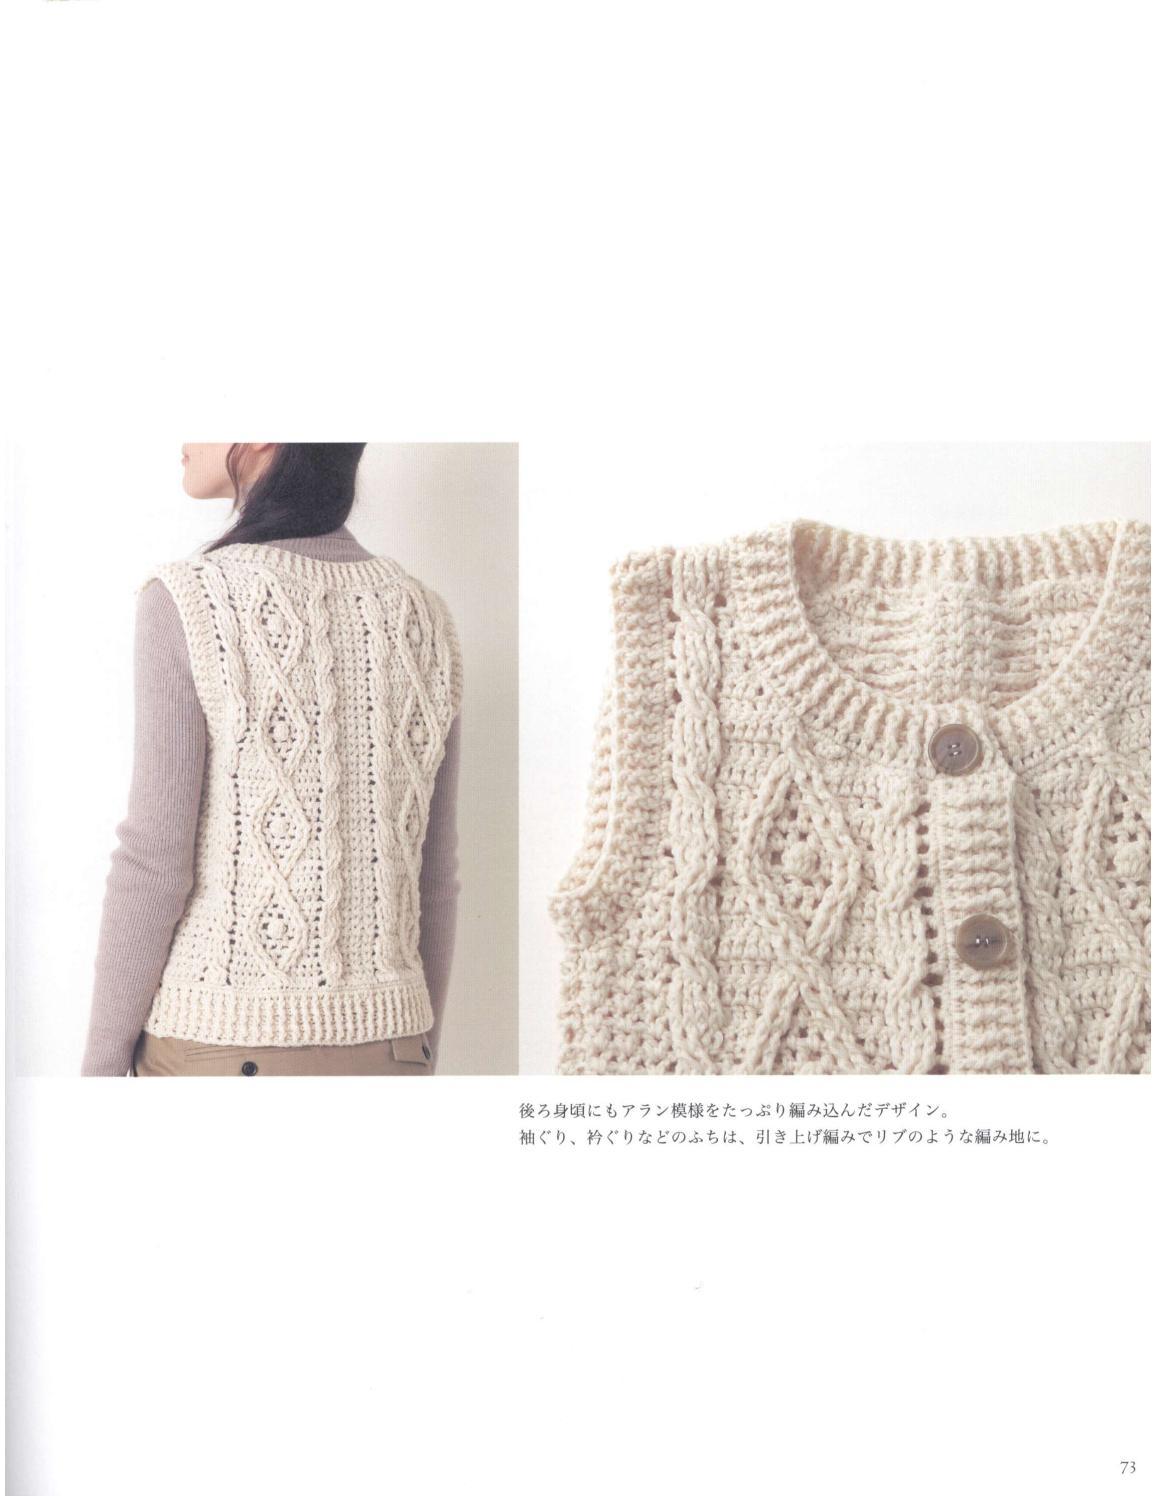 Asahi original crochet best selection 2012 page 73